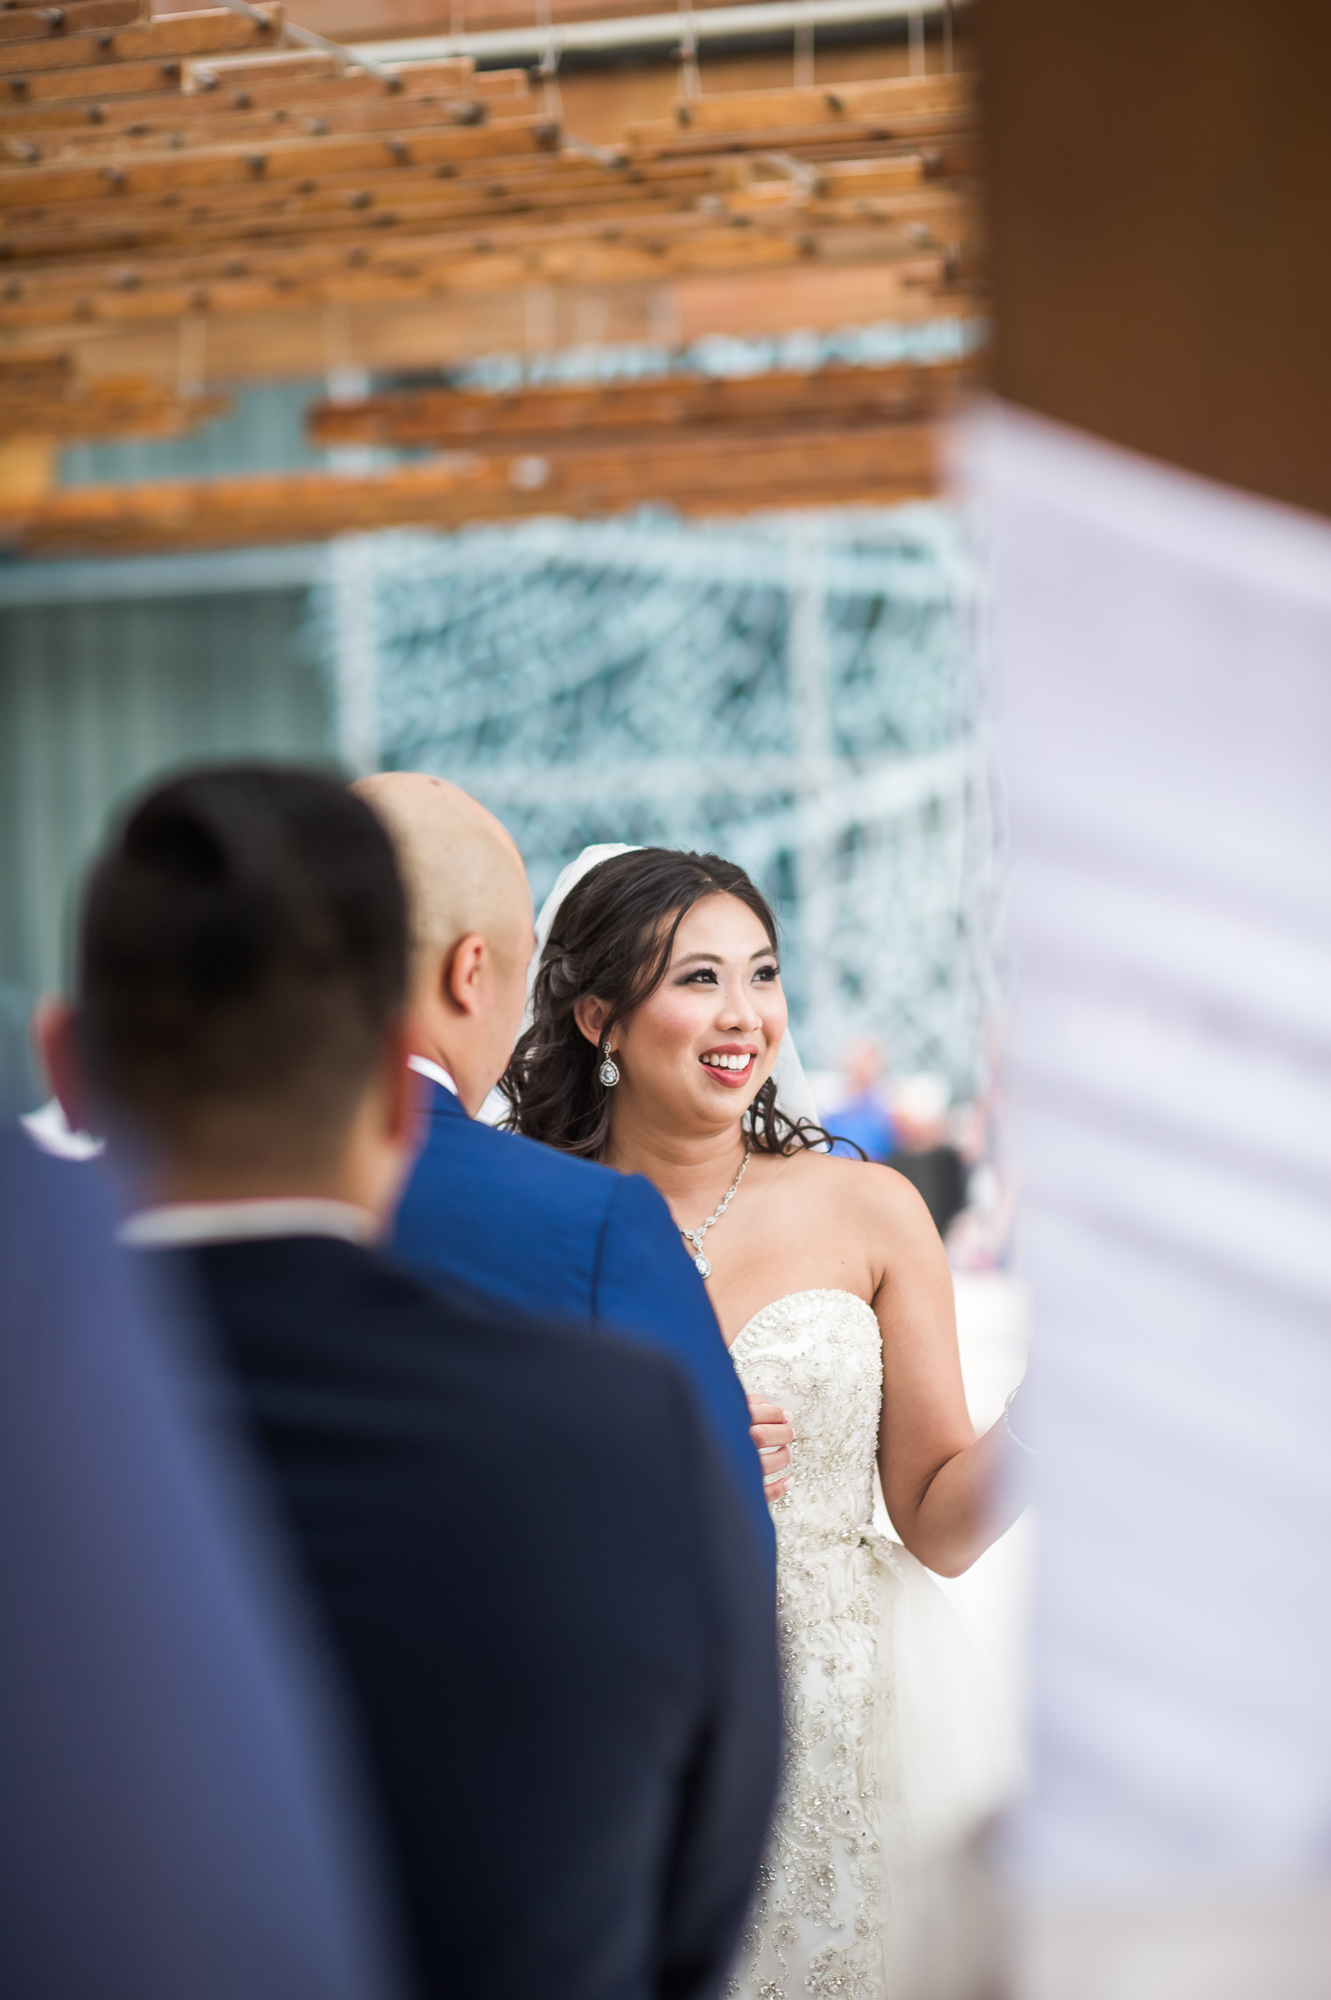 27-David Loi Studios - Cancun - Mexico - Destination Wedding-15567.jpg